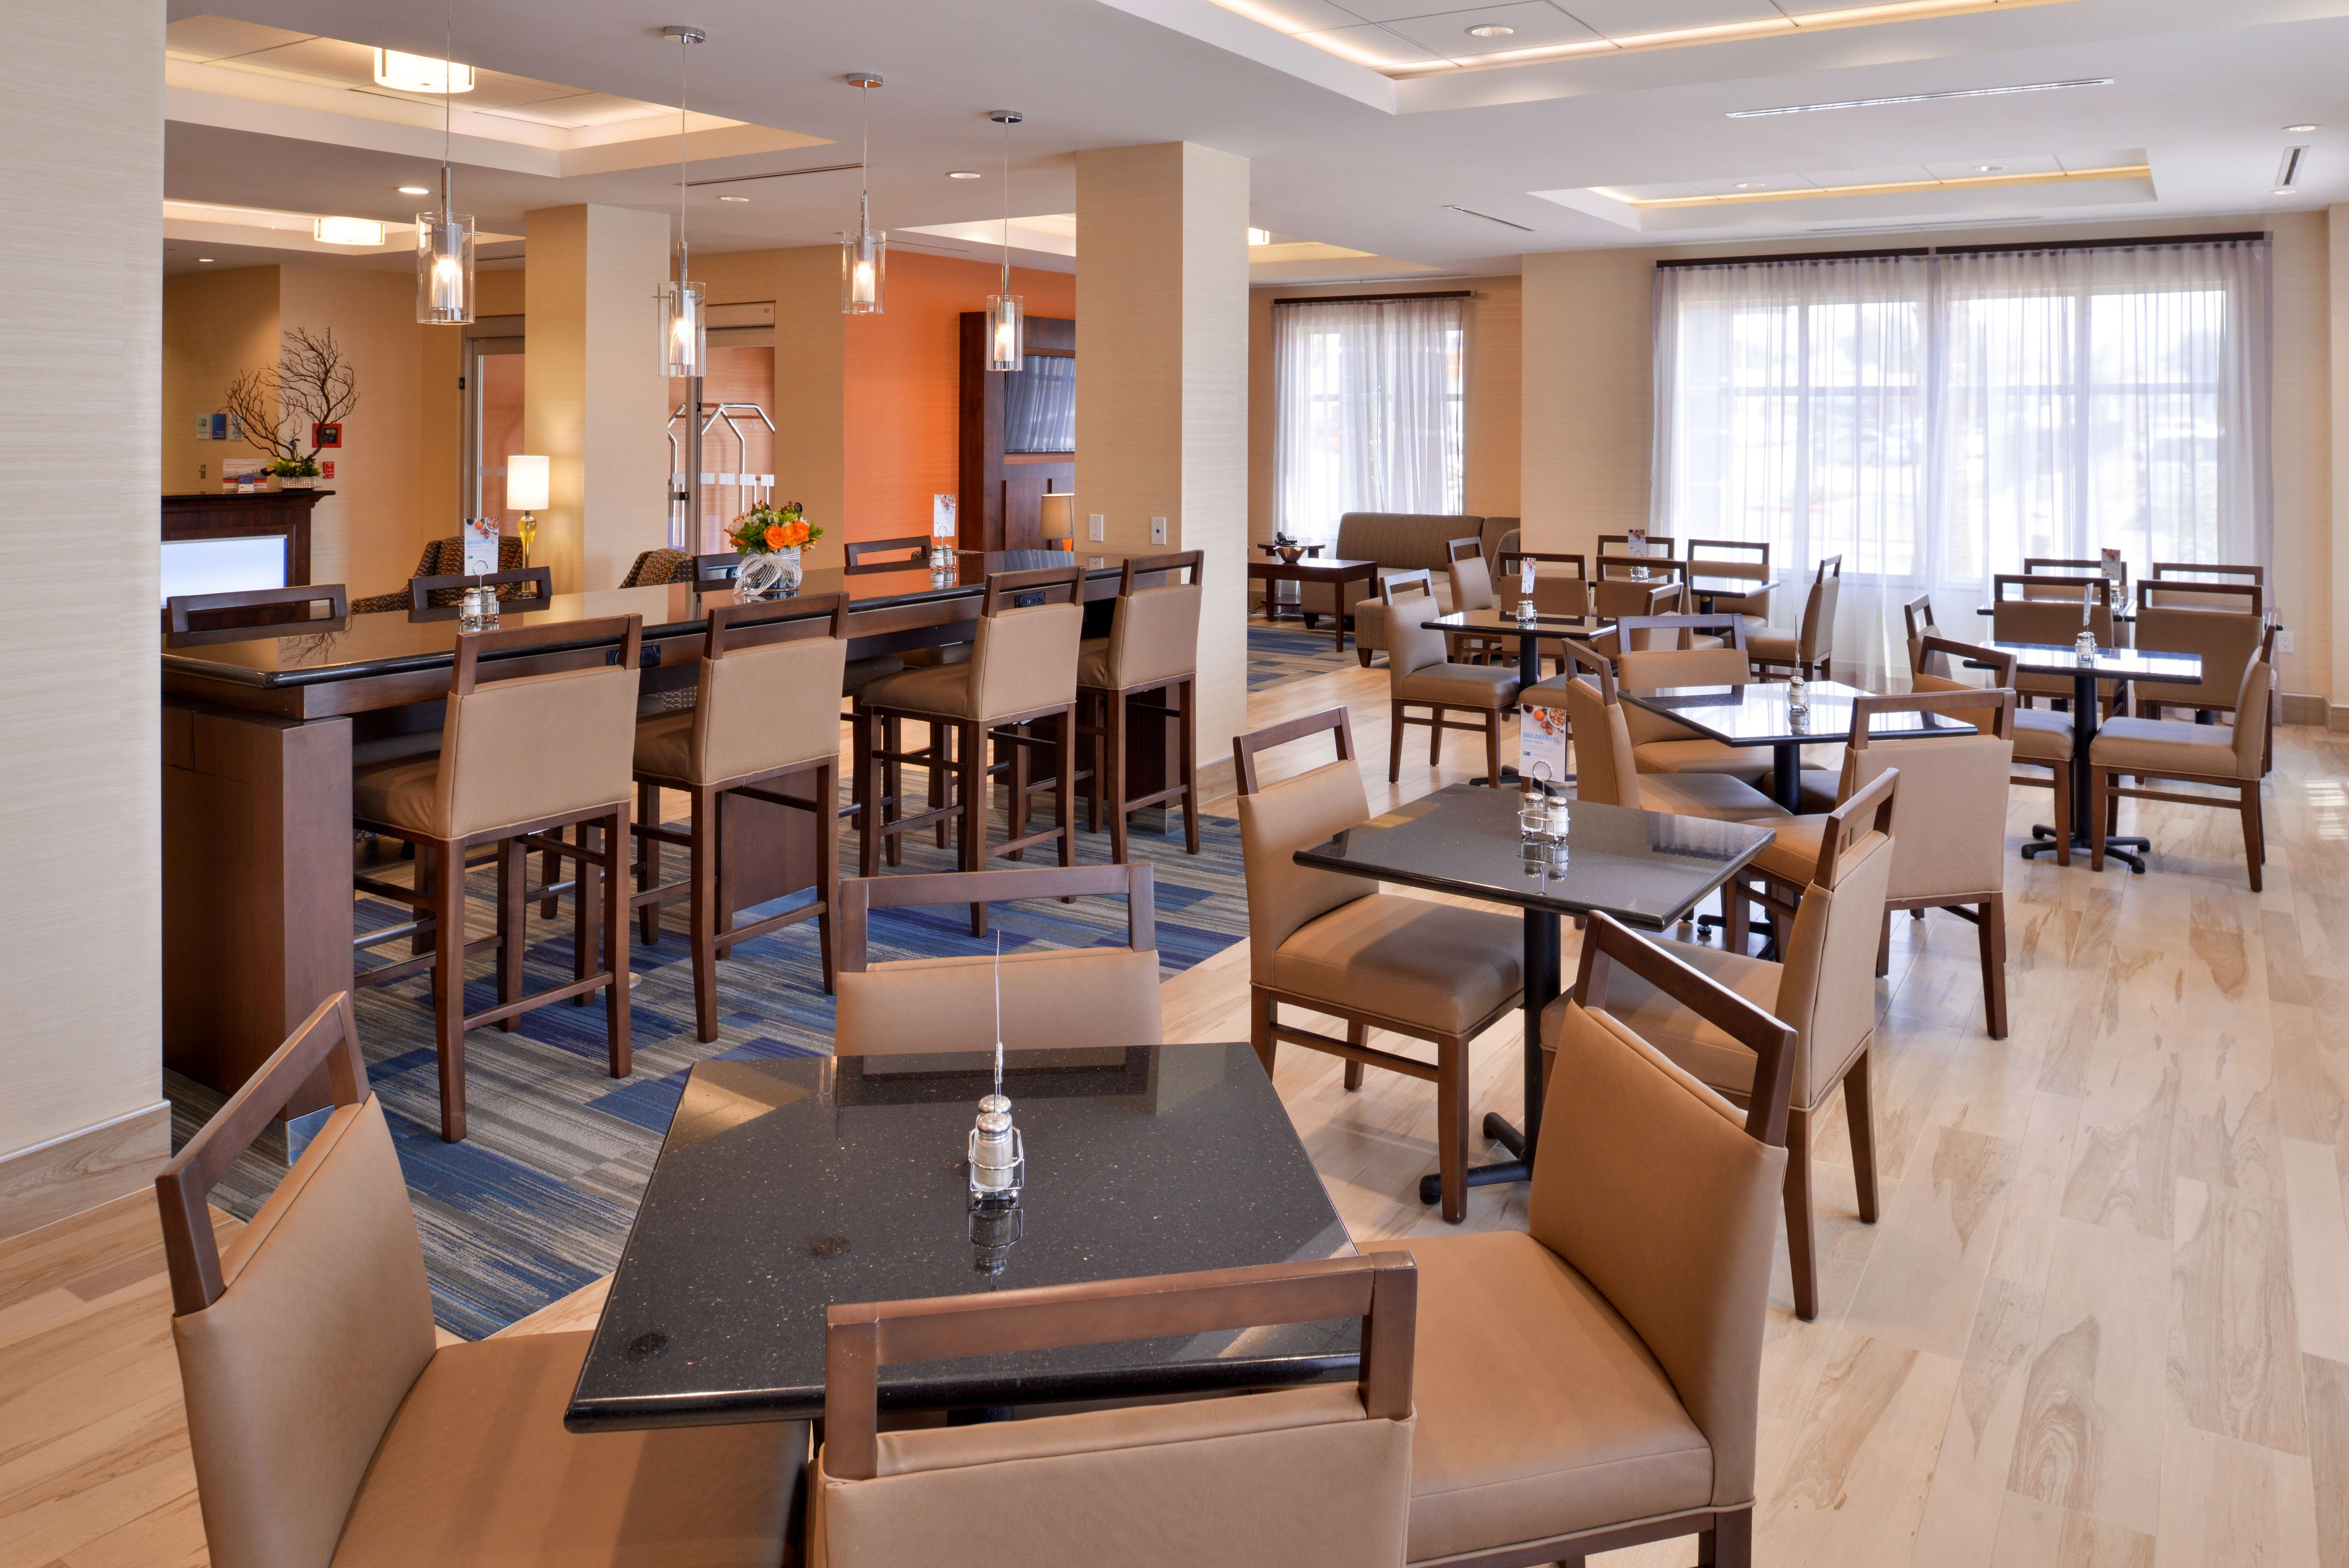 Holiday Inn Express & Suites Loma Linda- San Bernardino S image 1